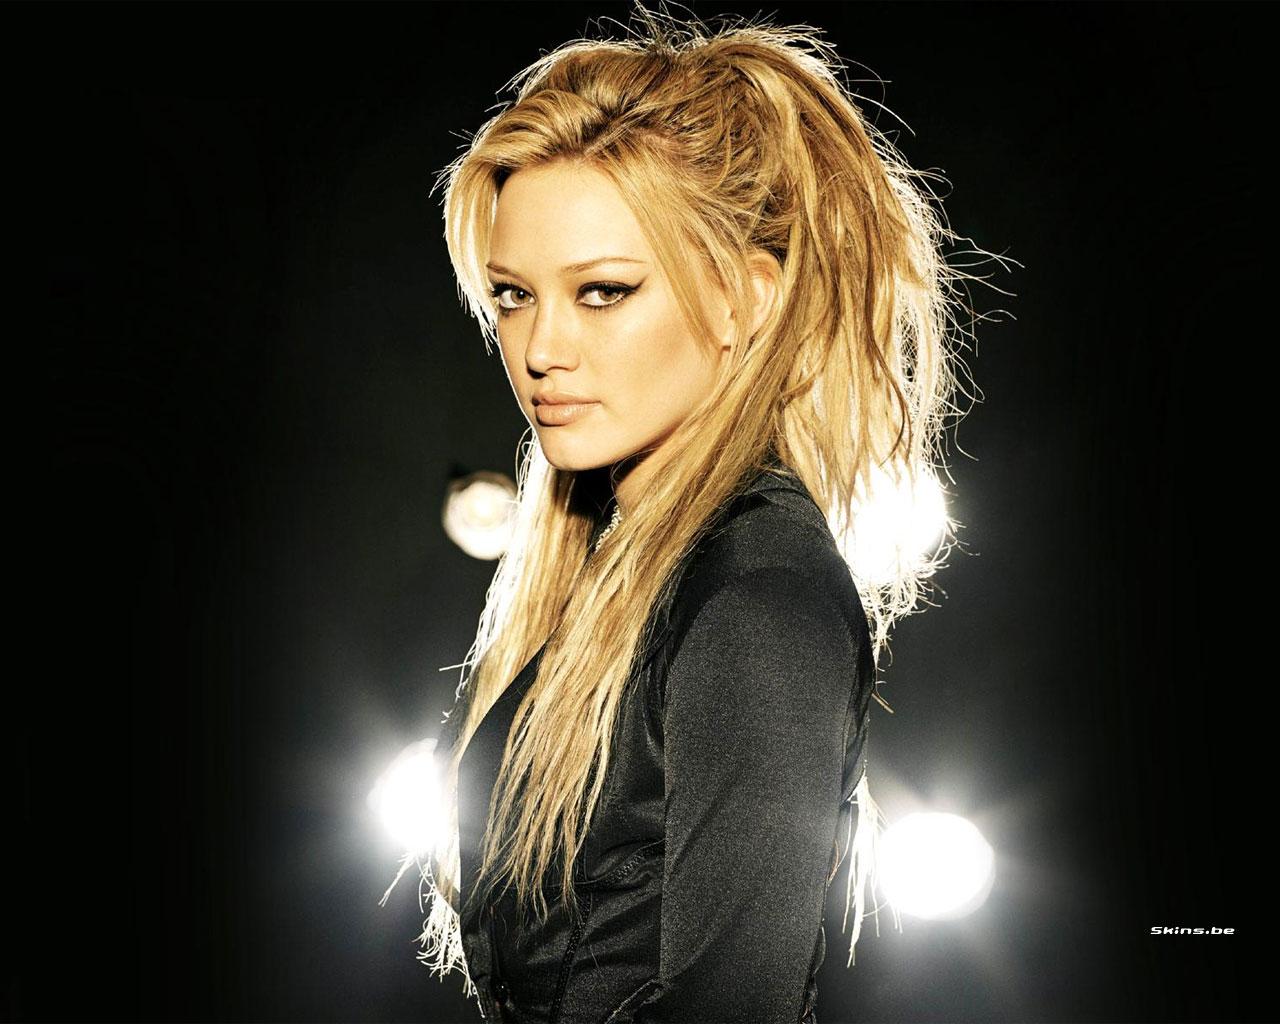 Hilary Duff wallpaper (#22281)